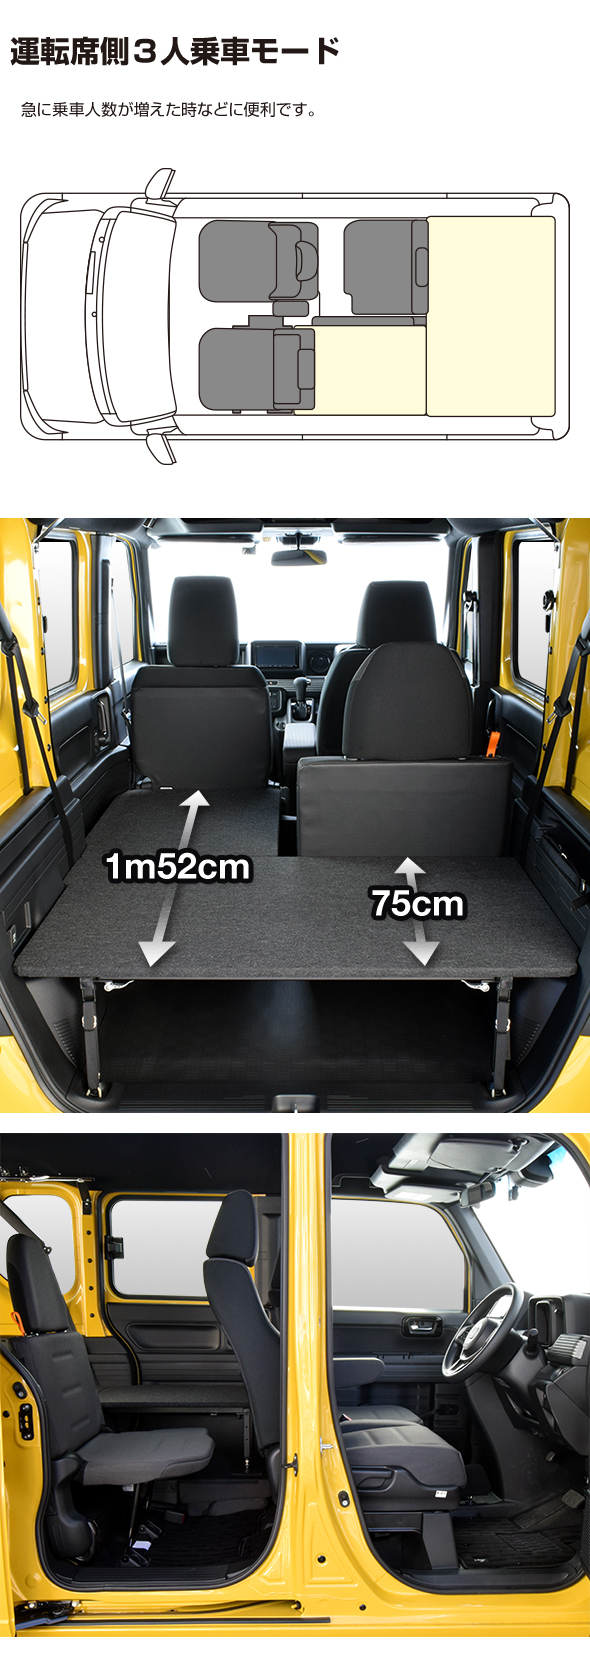 N-VAN +STYLE FUN +STYLE COOL Honda ホンダ エヌバン BEDKIT(ベッドキット)運転席側3人乗車モード